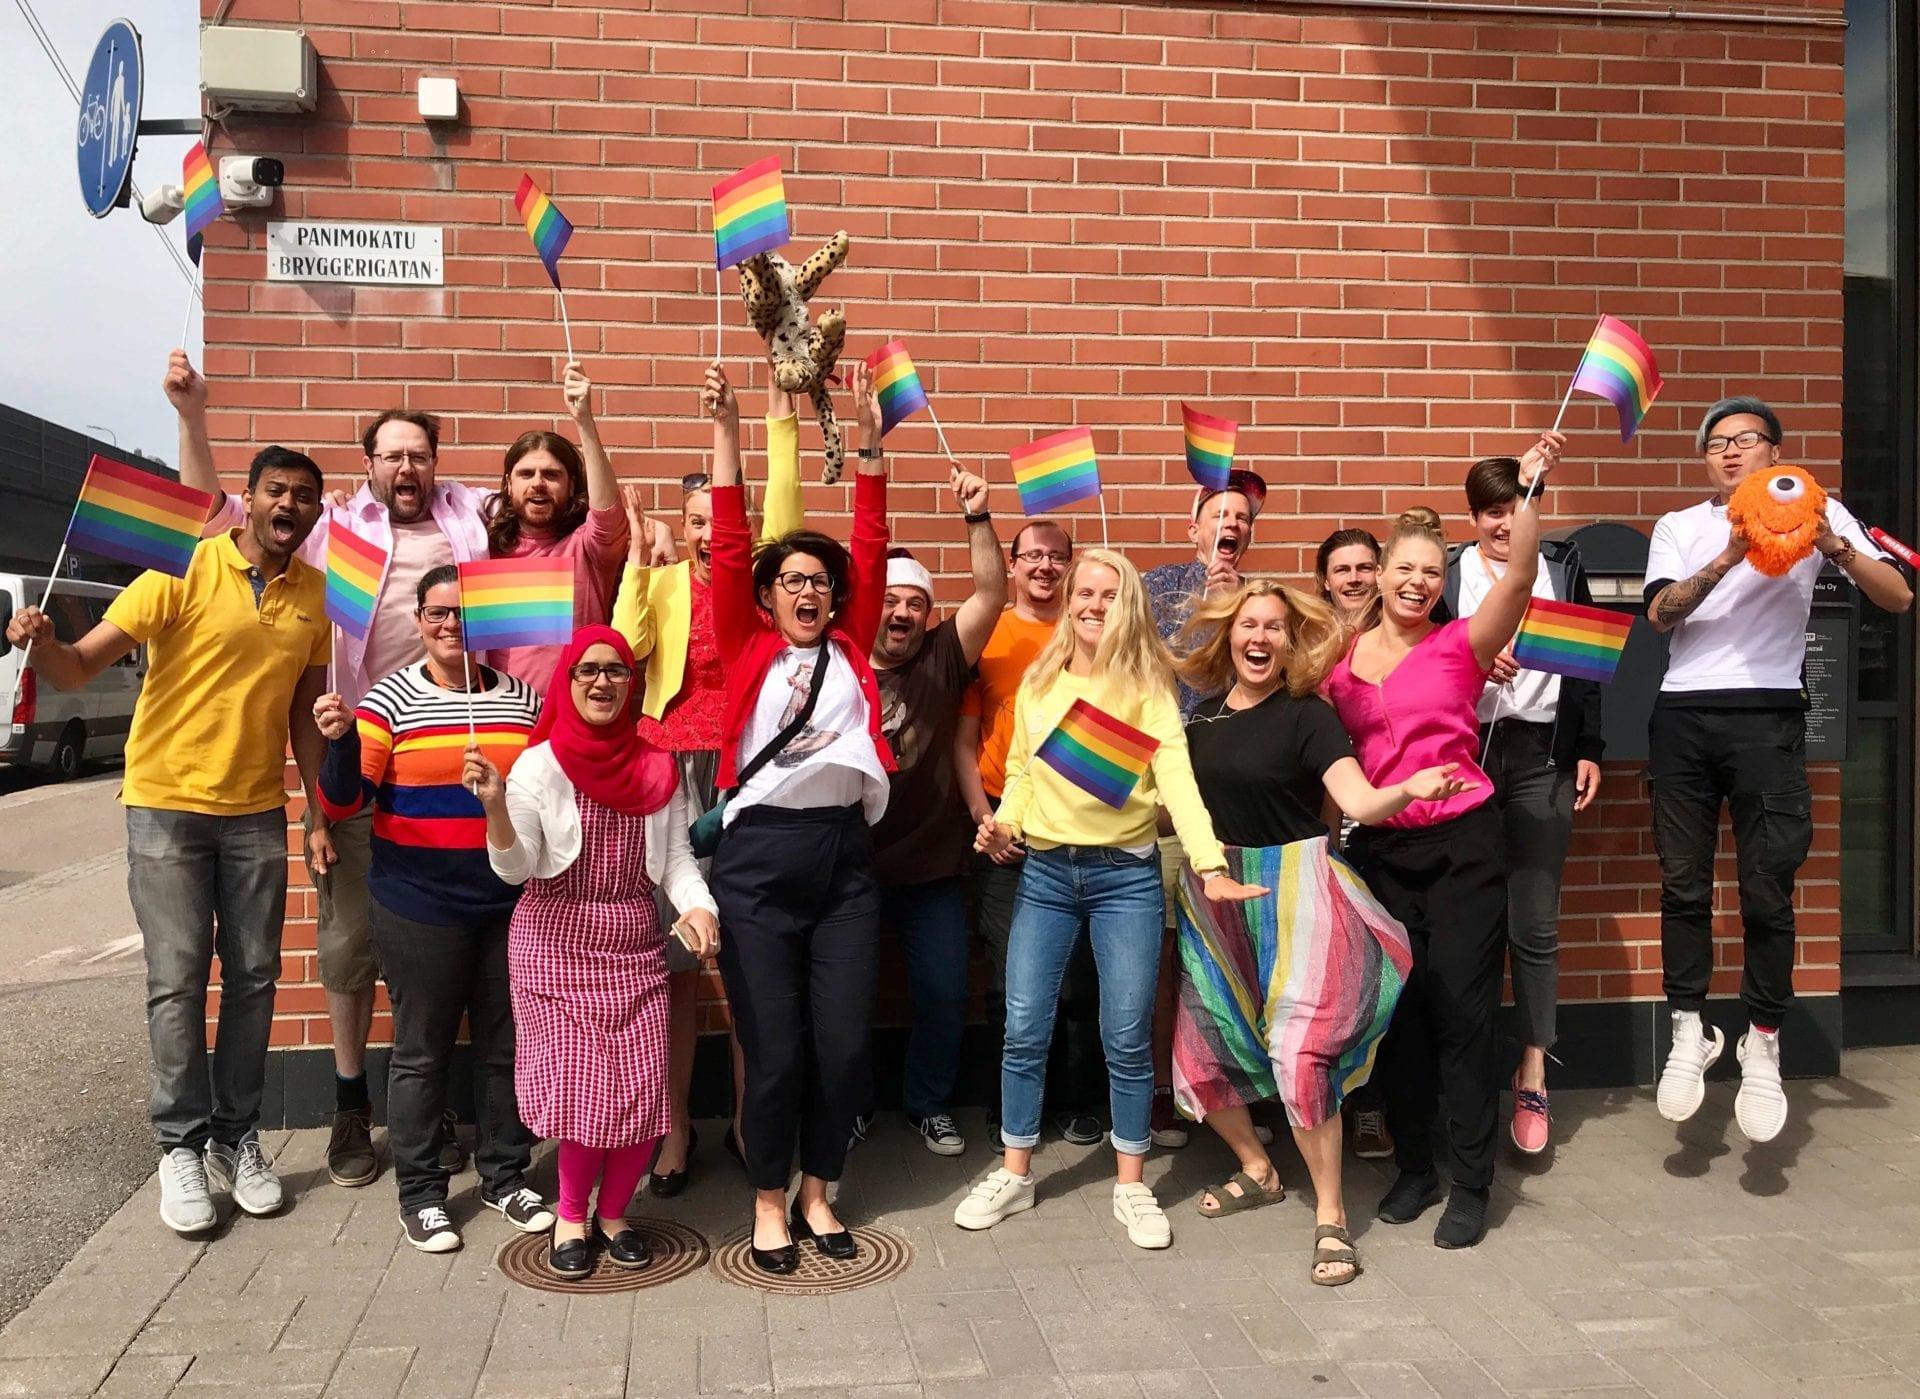 Frosmonauts support Pride